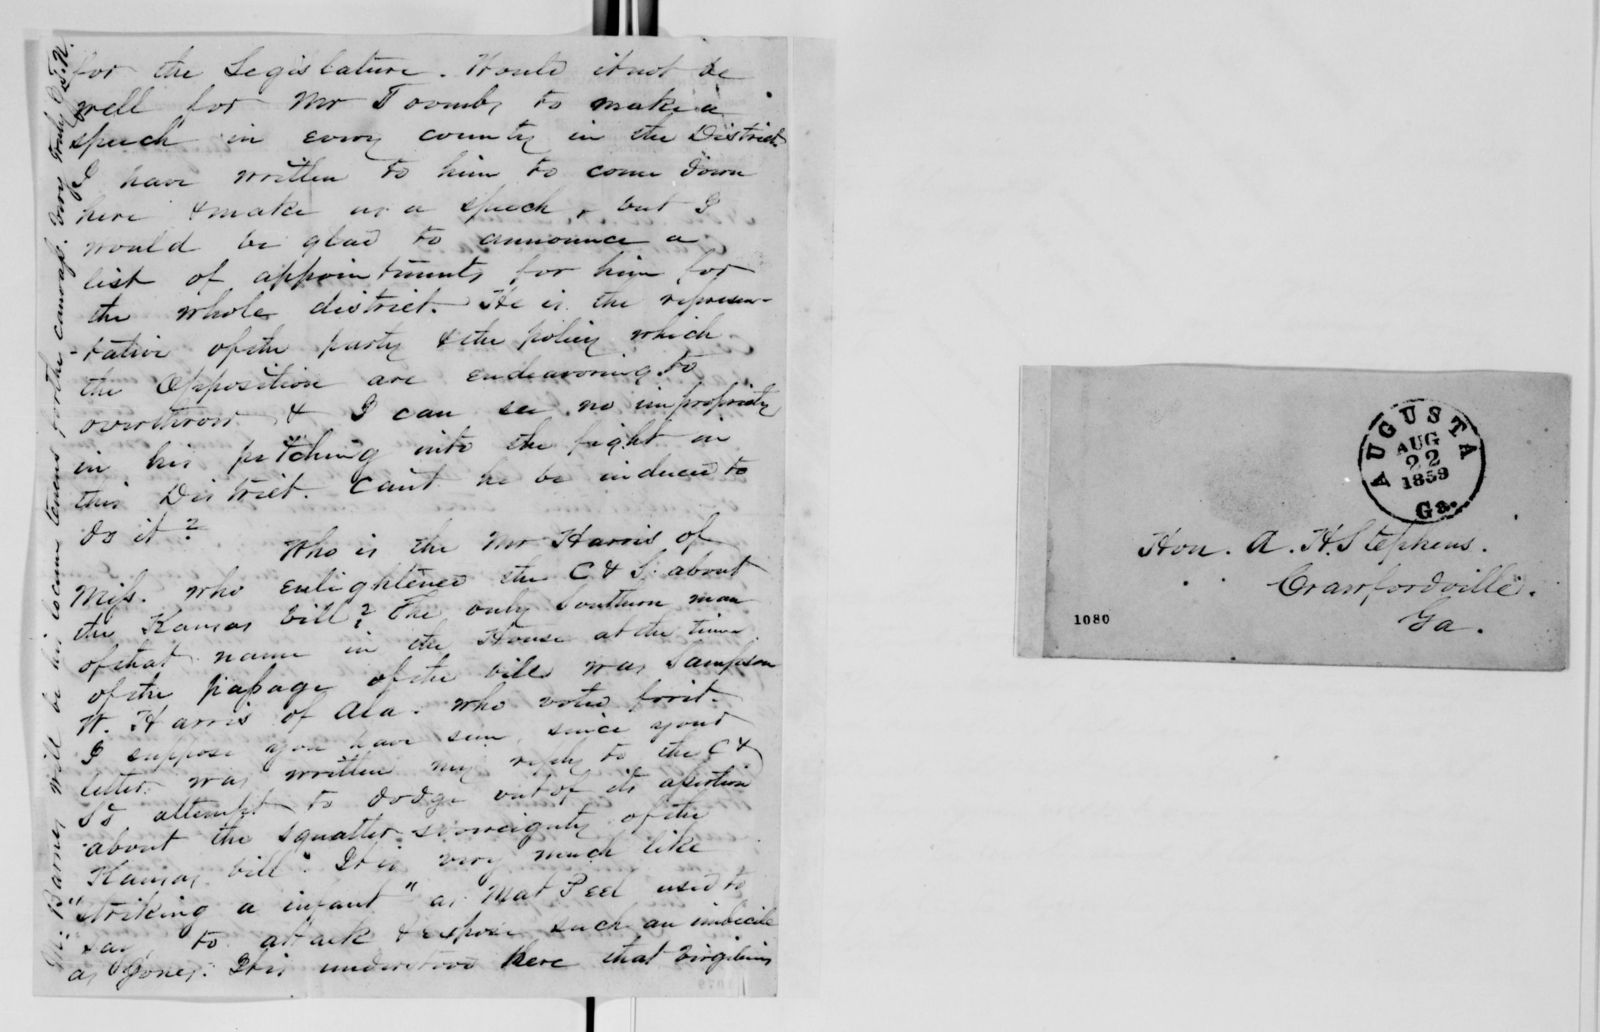 Alexander Hamilton Stephens Papers: General Correspondence, 1784-1886; 1859, July 17-Oct. 24